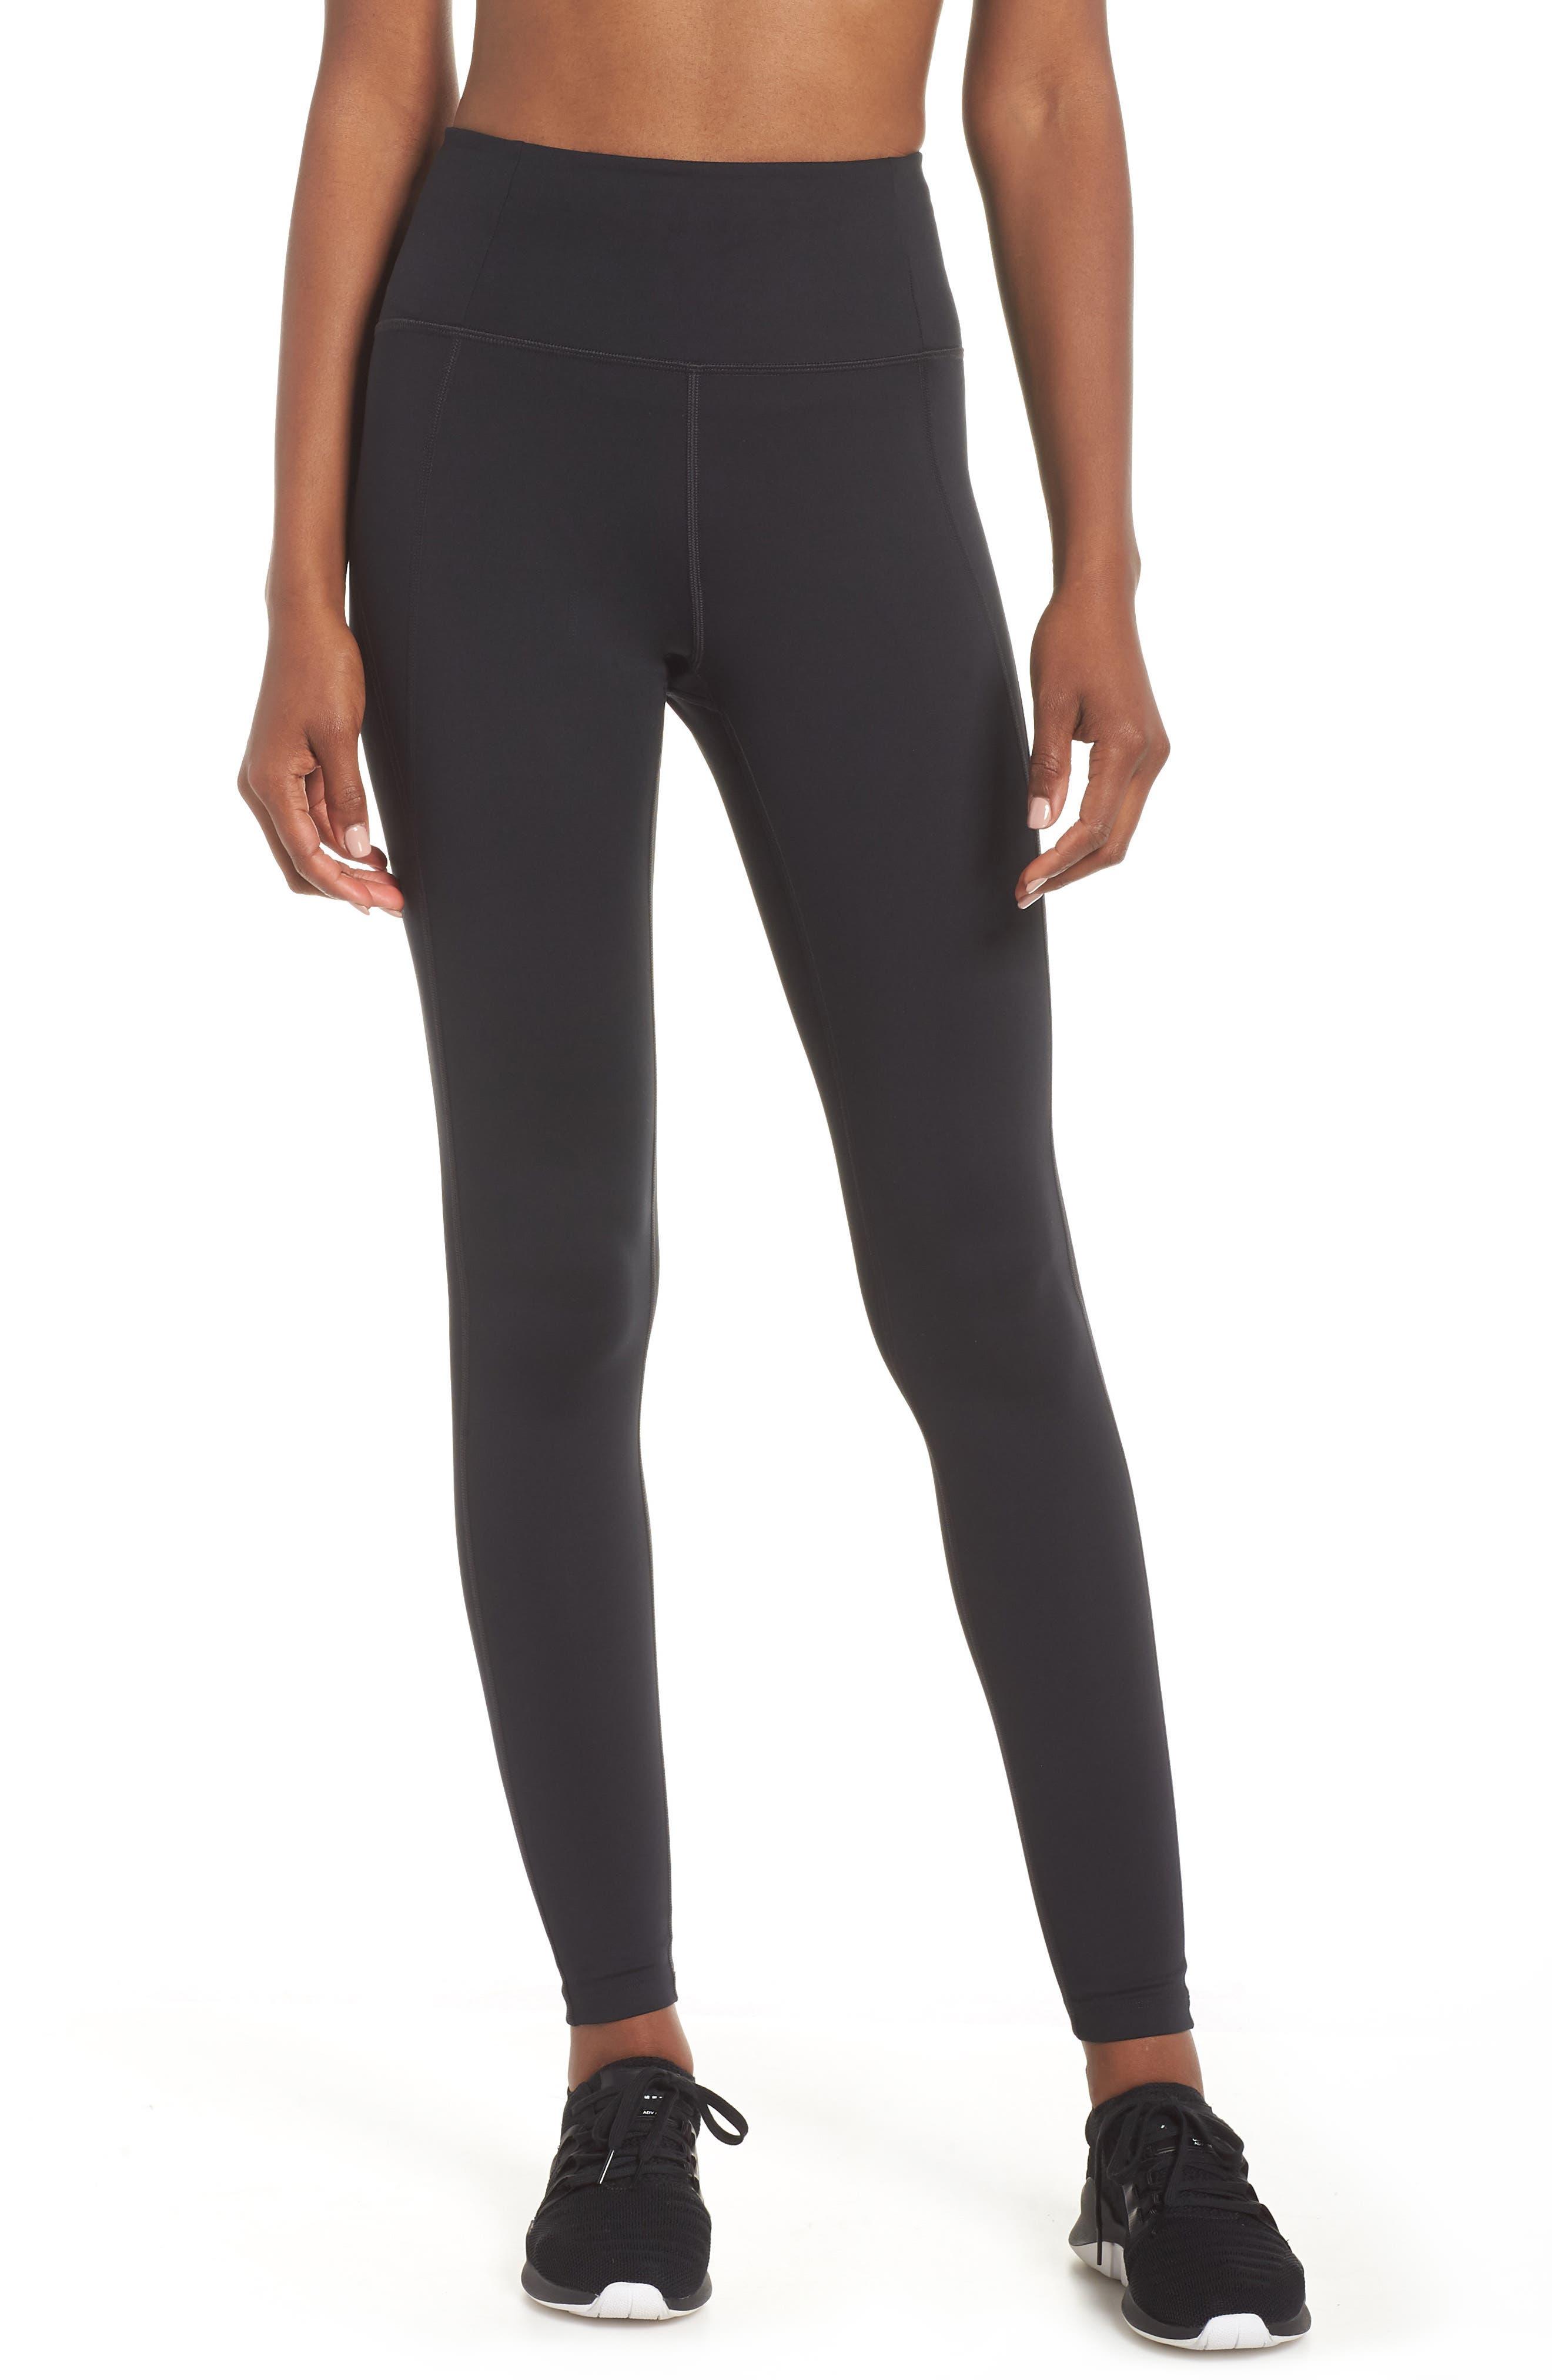 GIRLFRIEND COLLECTIVE High Waist Full Length Leggings, Main, color, BLACK